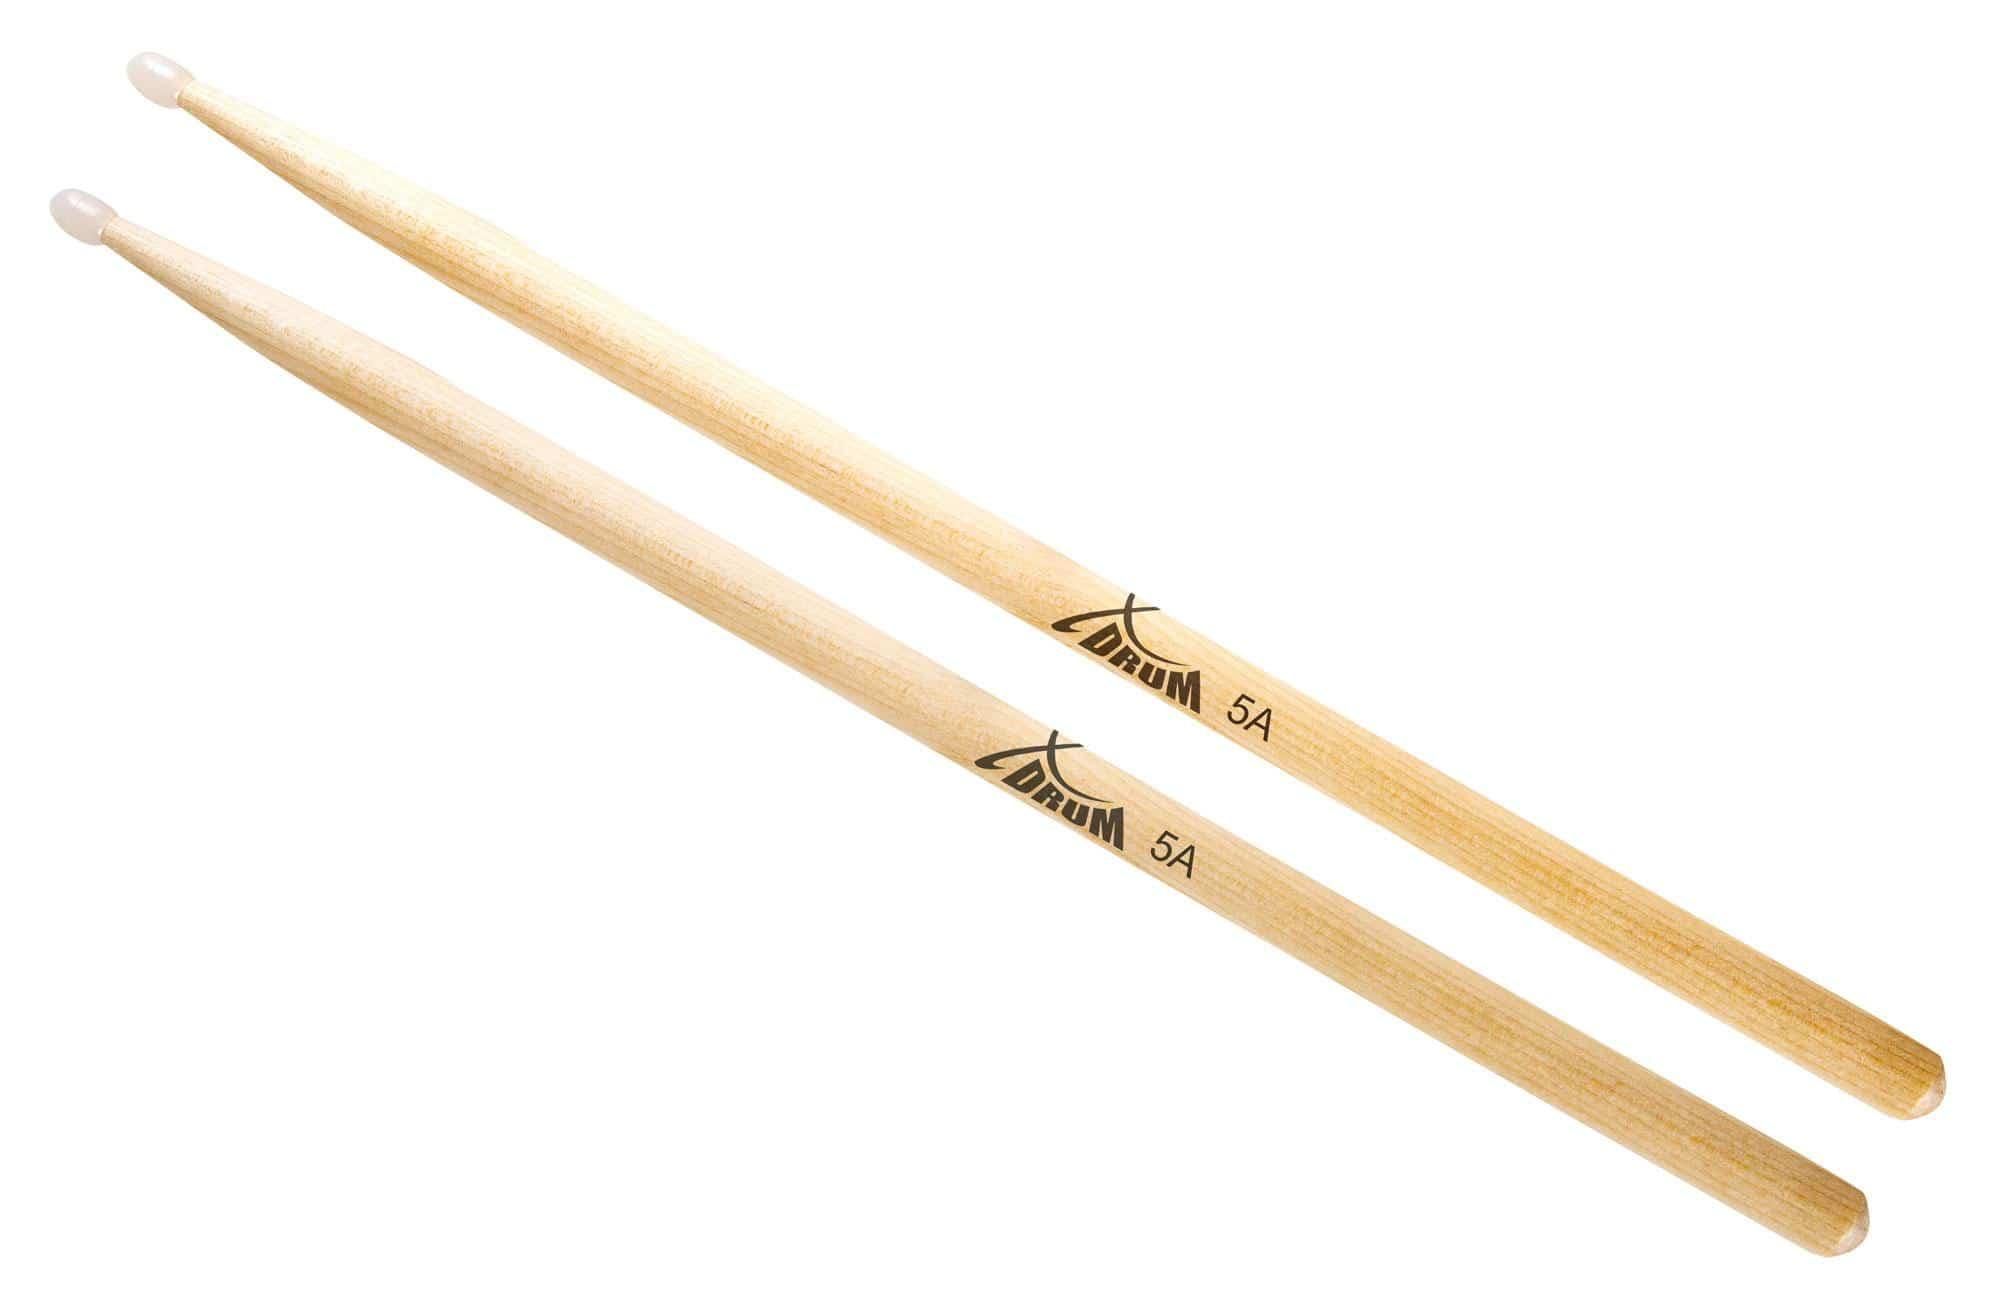 XDrum Schlagzeug Sticks 5A Nylon Tip